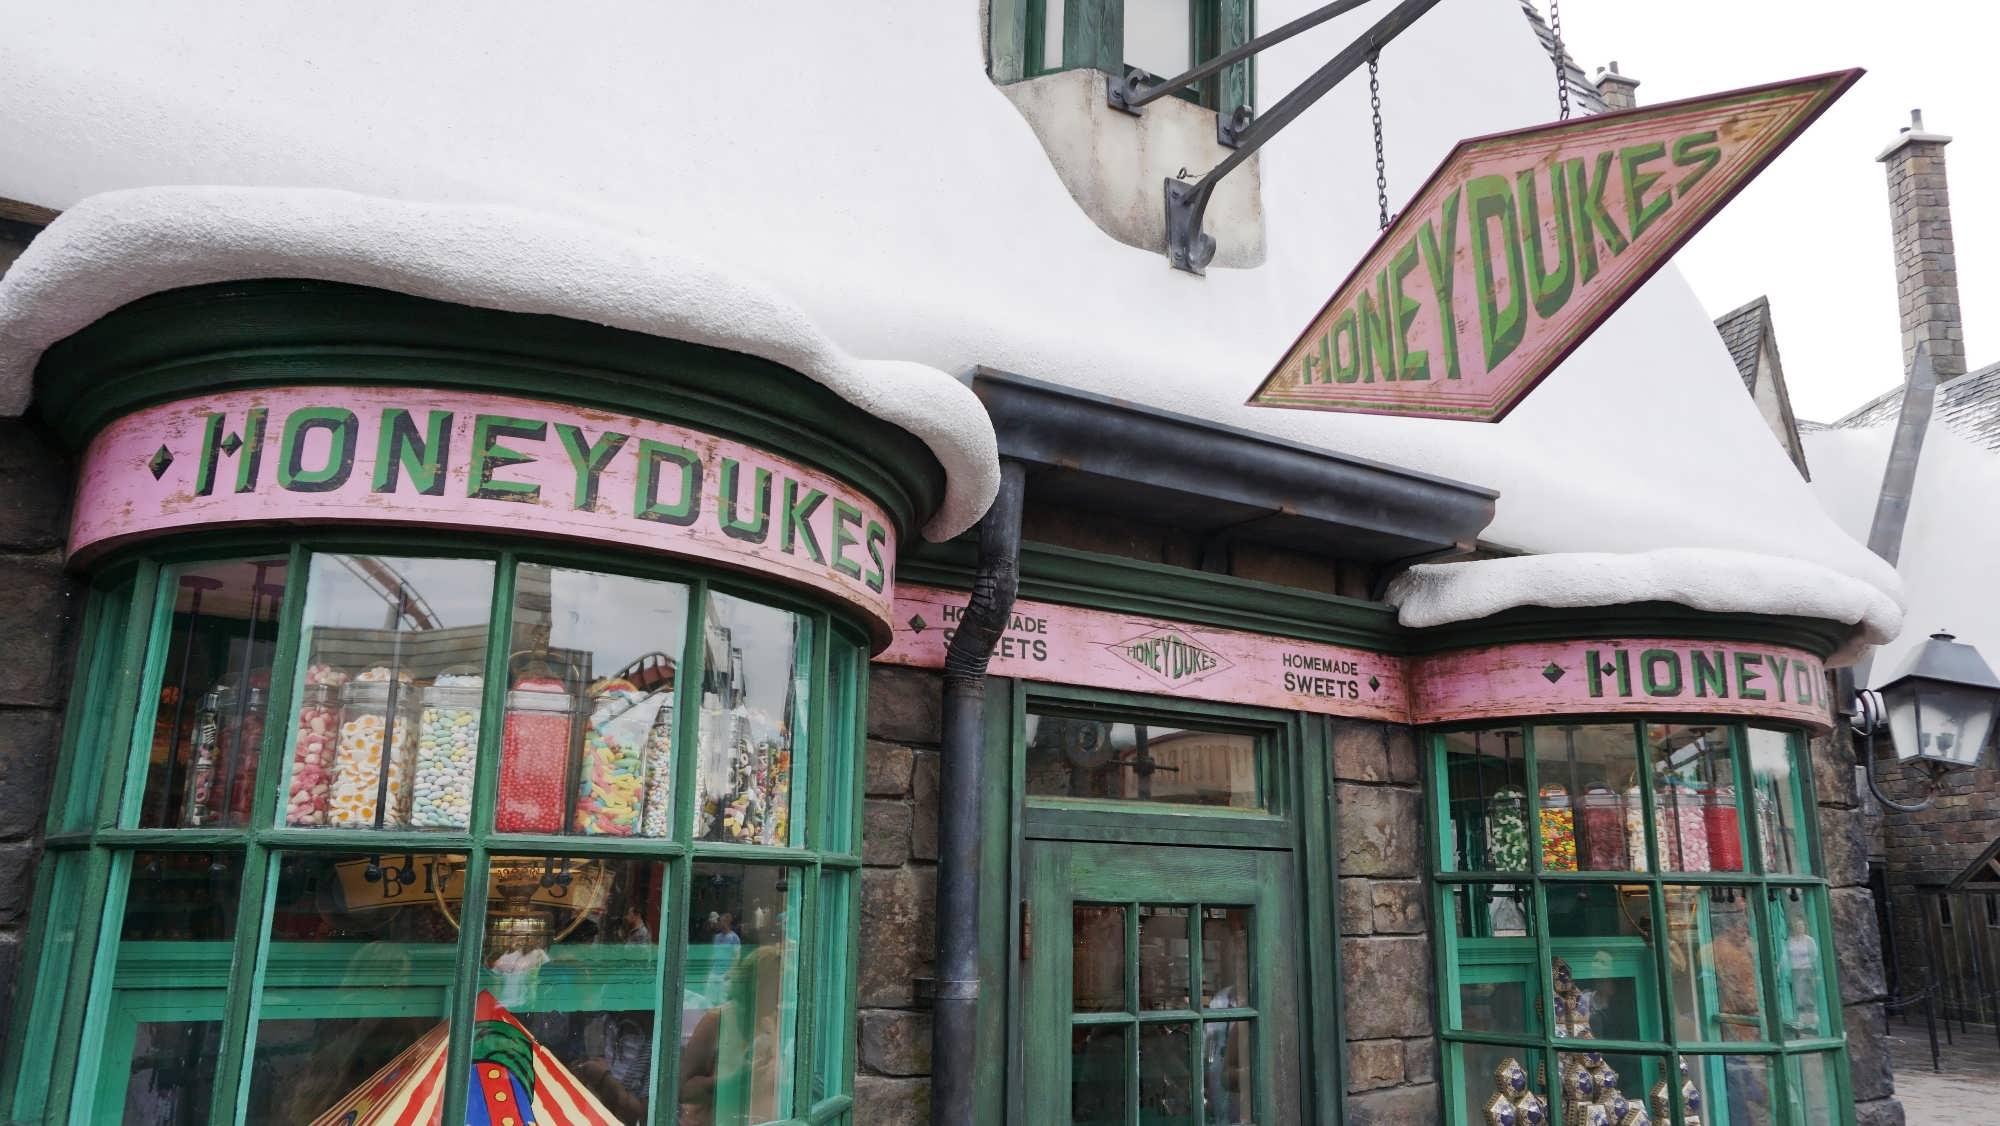 Honeydukes candy shop inside The Wizarding World of Harry Potter - Hogsmeade